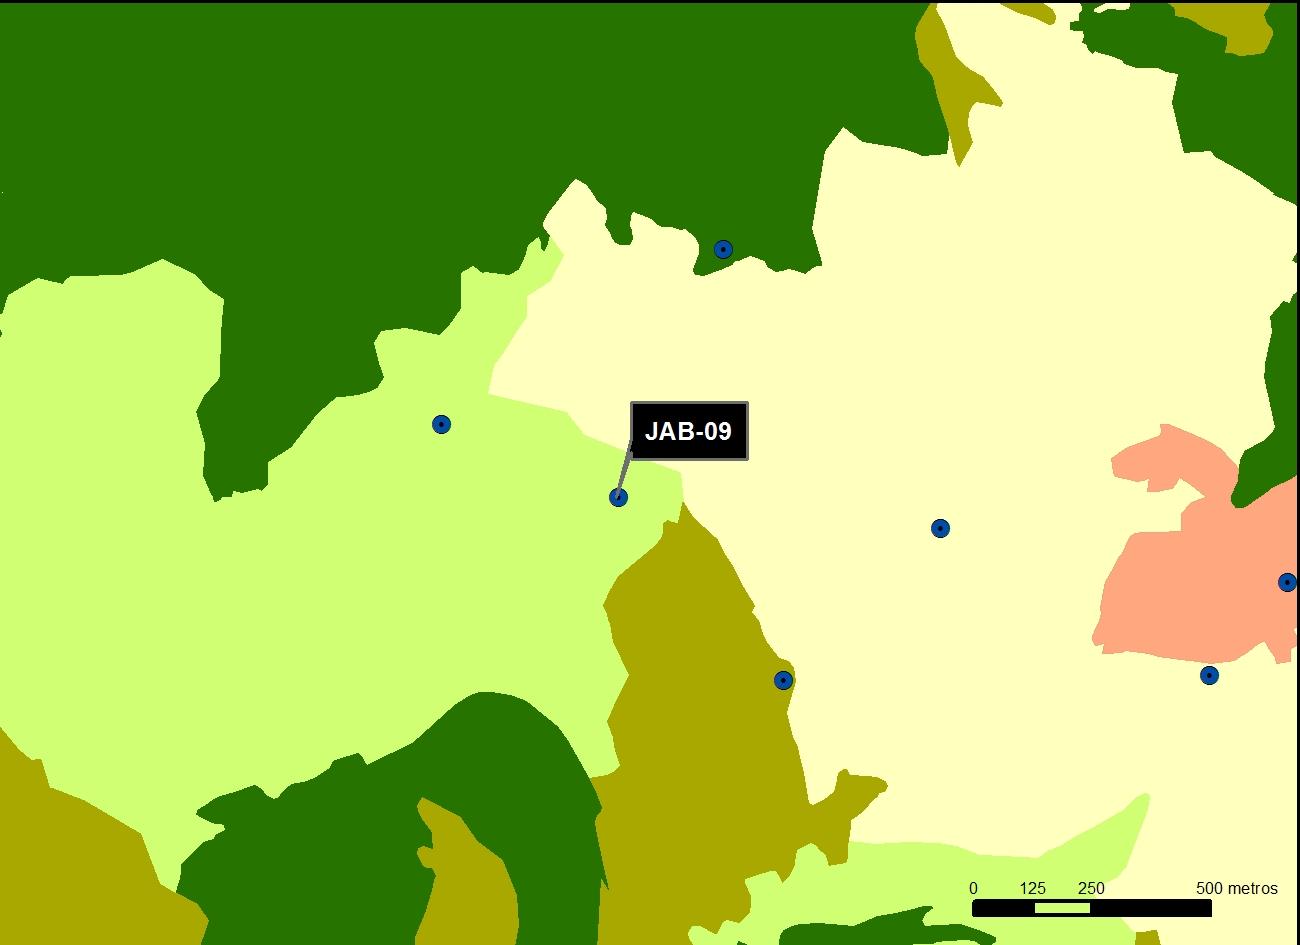 JAB_09_M.V.LOZANO_ENCUBIERTA_MAP.VEG